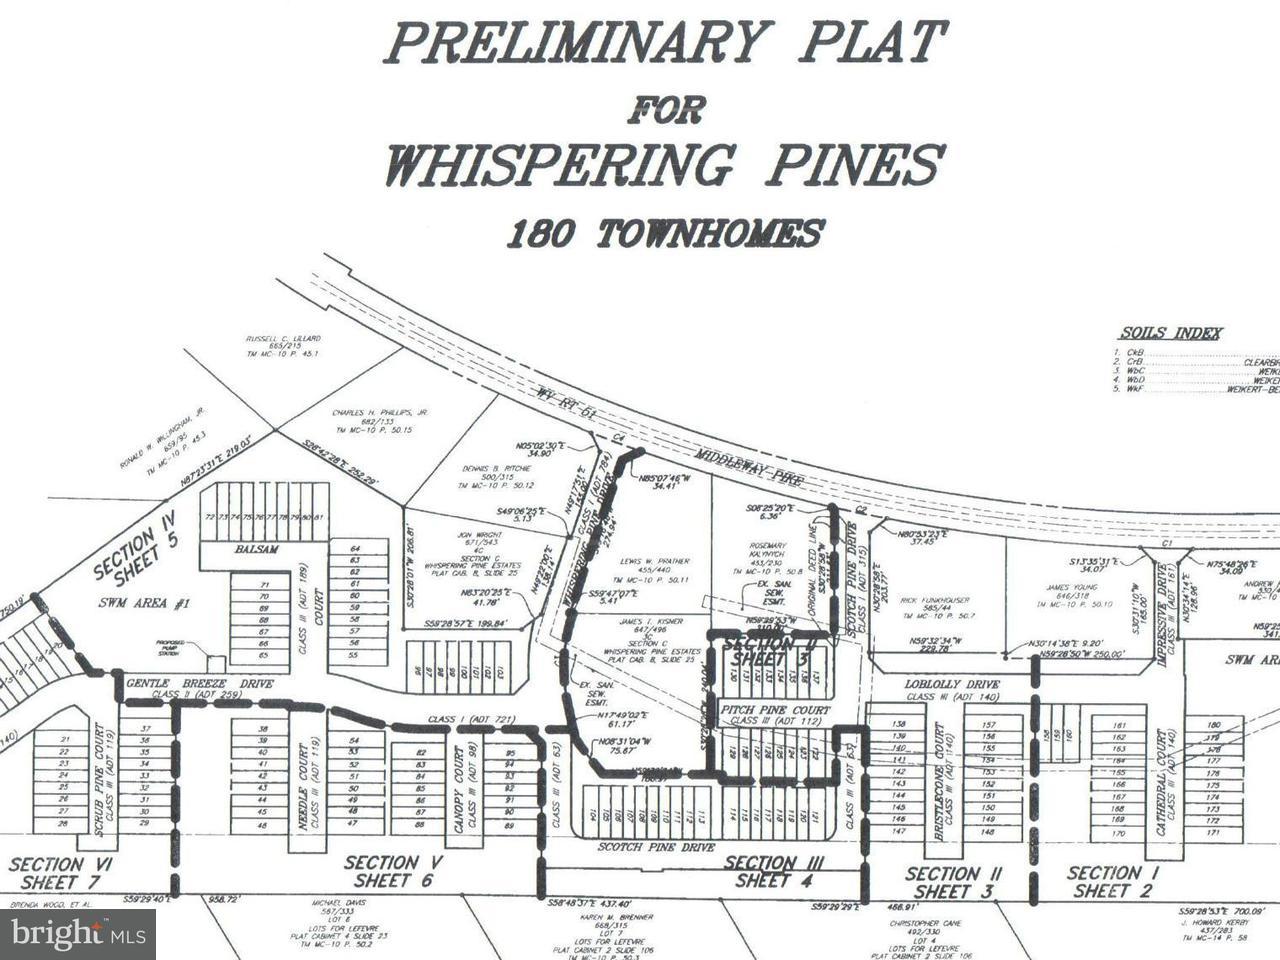 Terreno para Venda às WHISPERING PINES S/D WHISPERING PINES S/D Bunker Hill, West Virginia 25413 Estados Unidos